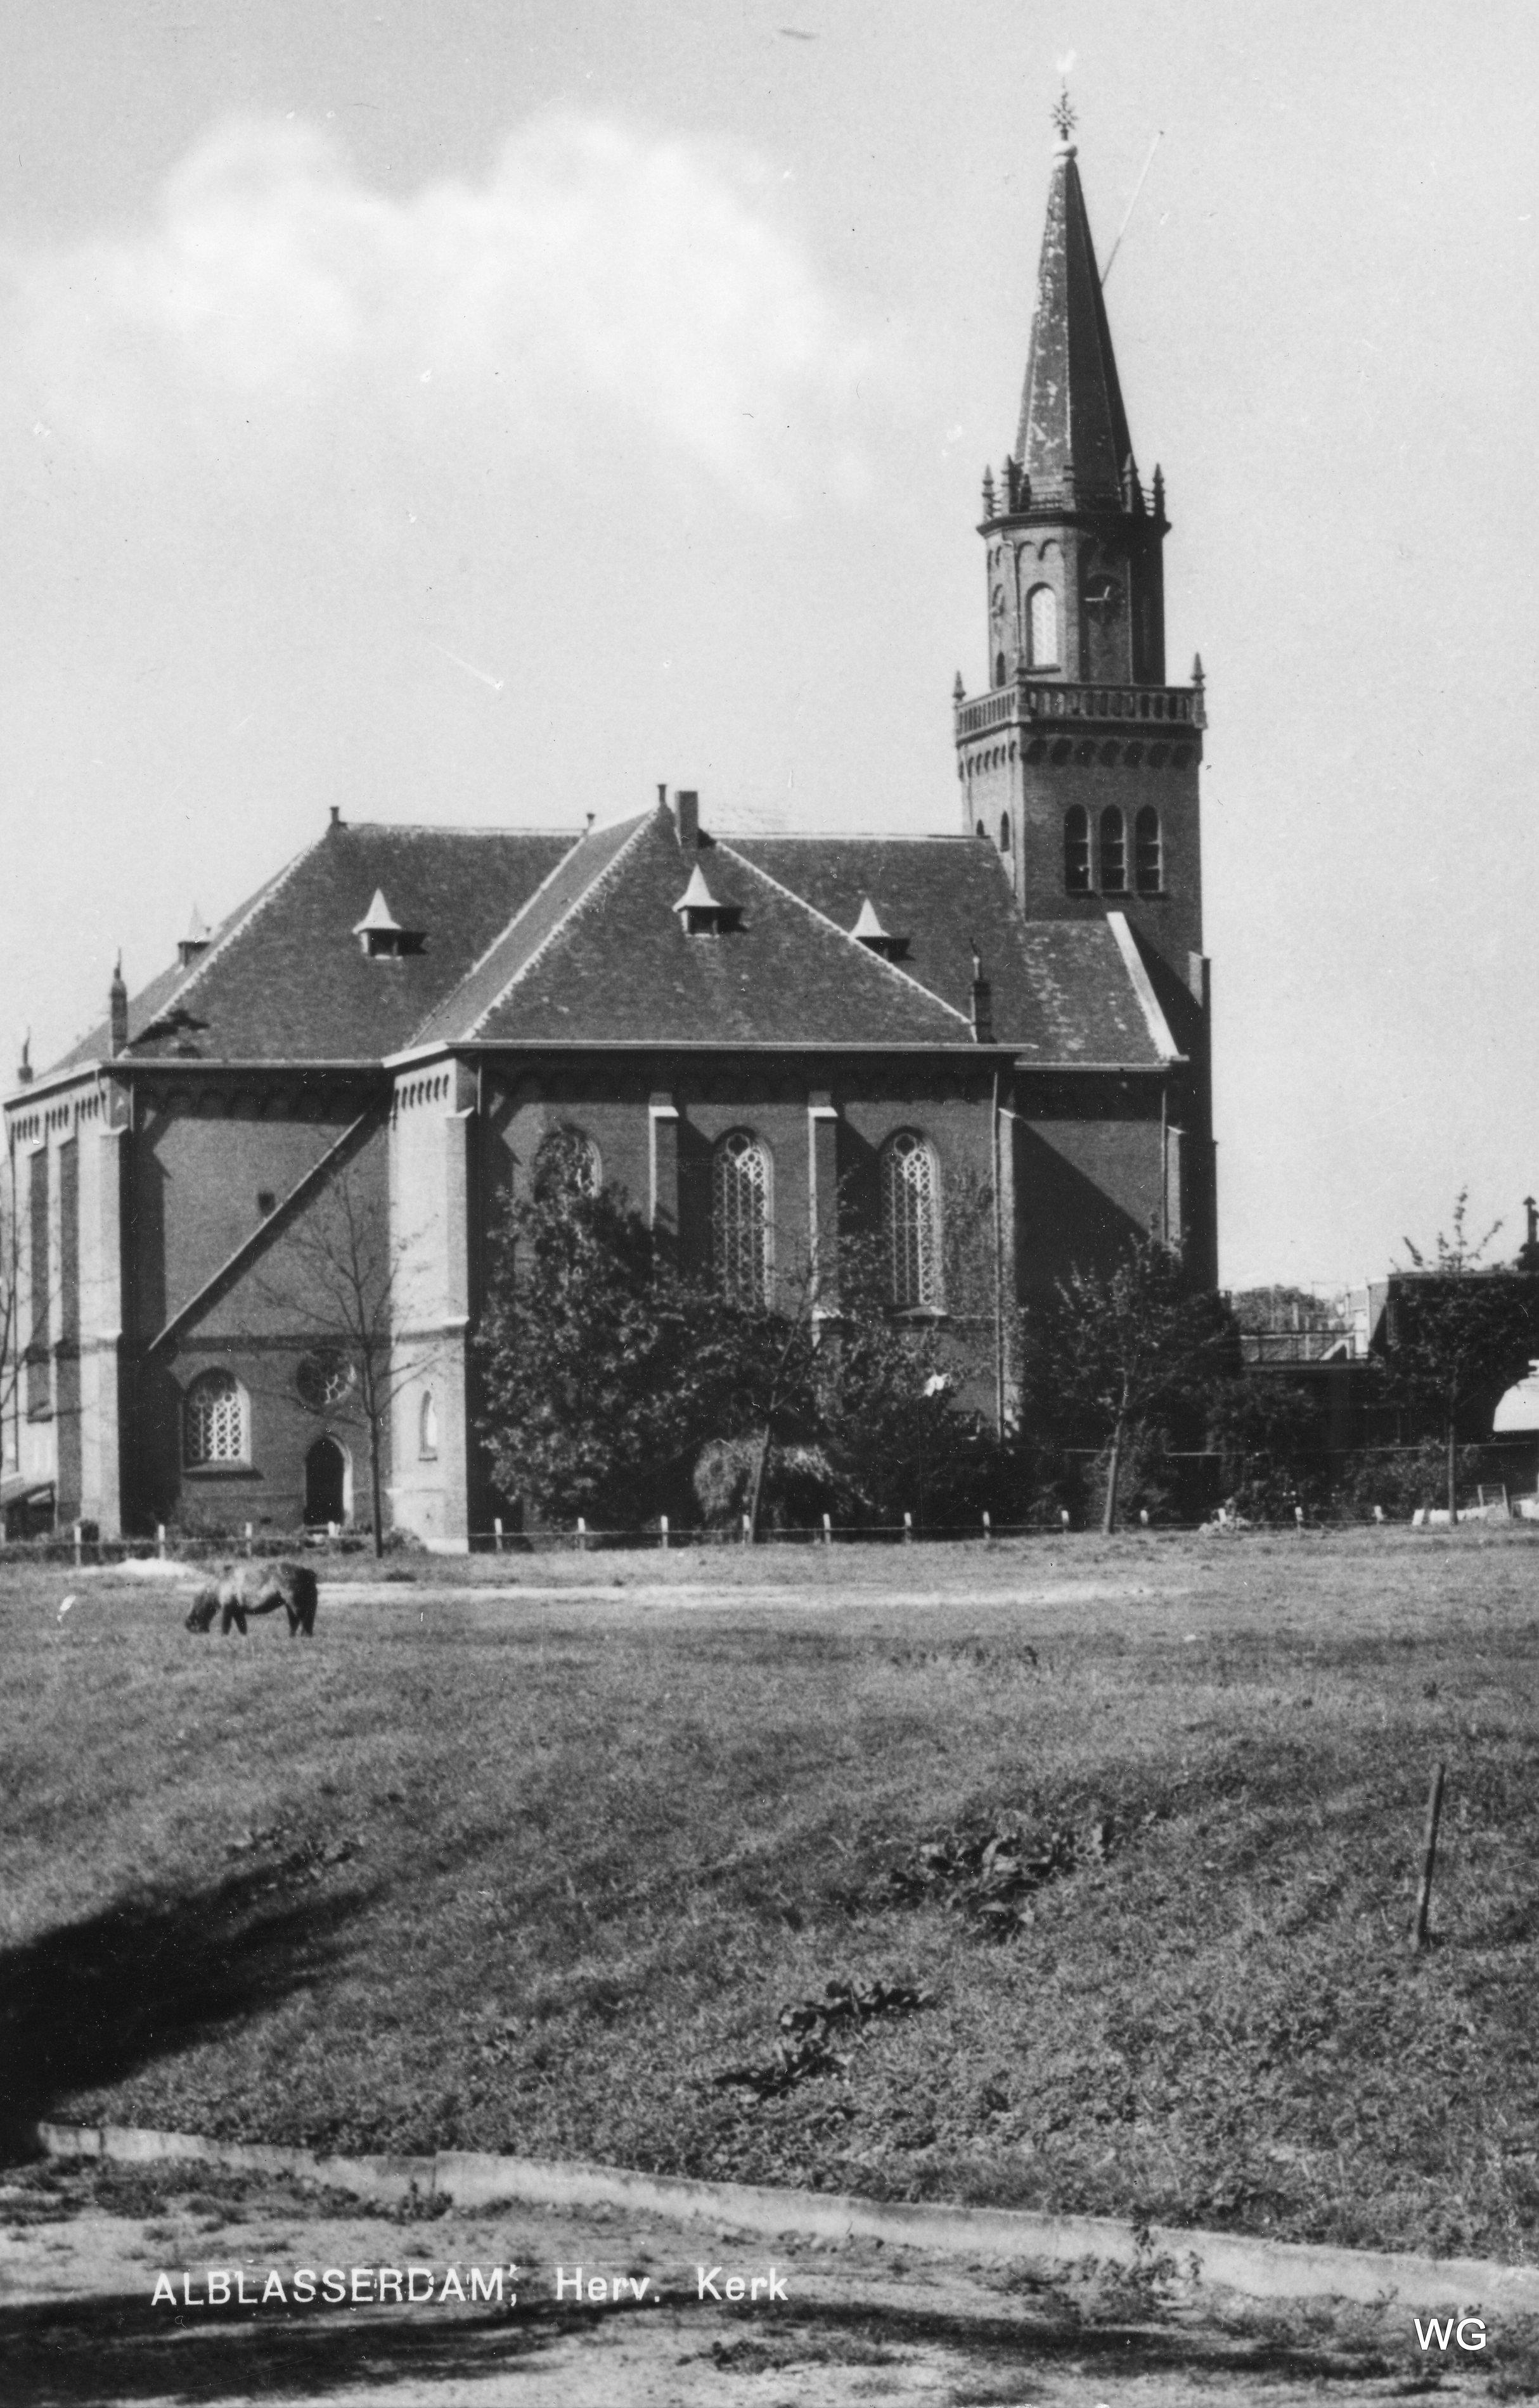 pkn alblasserdam grote kerk